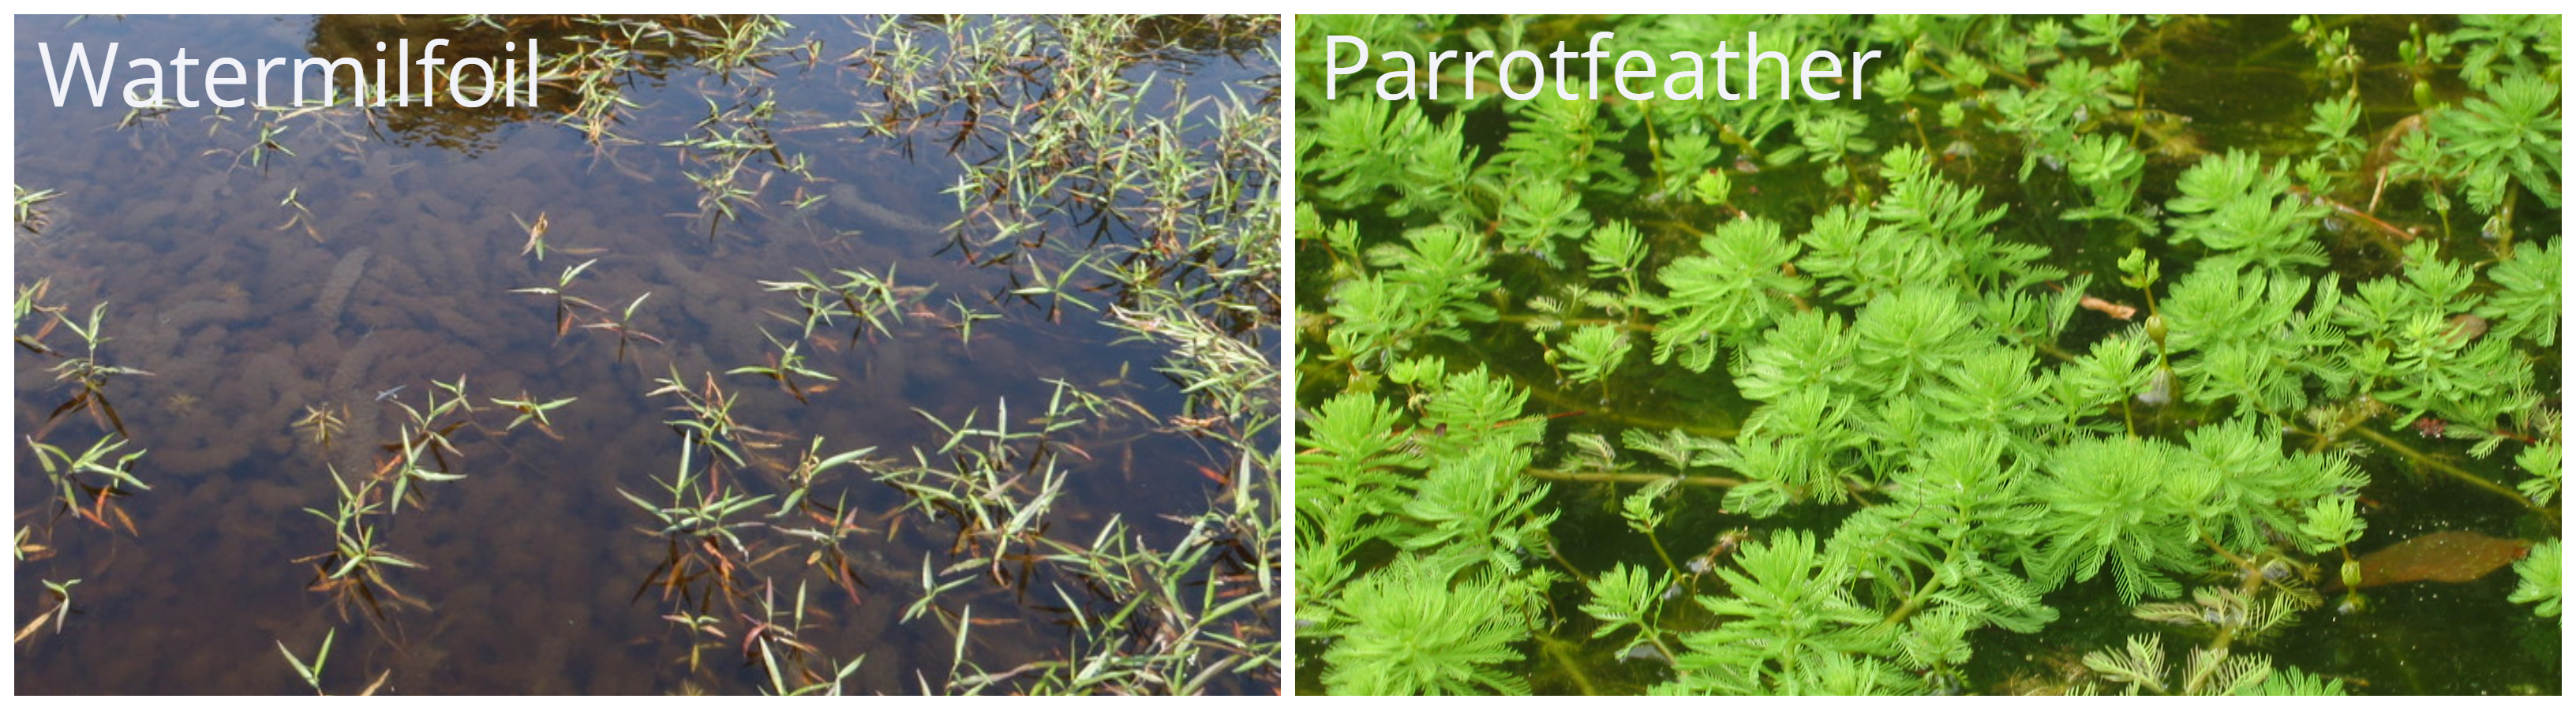 Parrotfeather watermilfoil